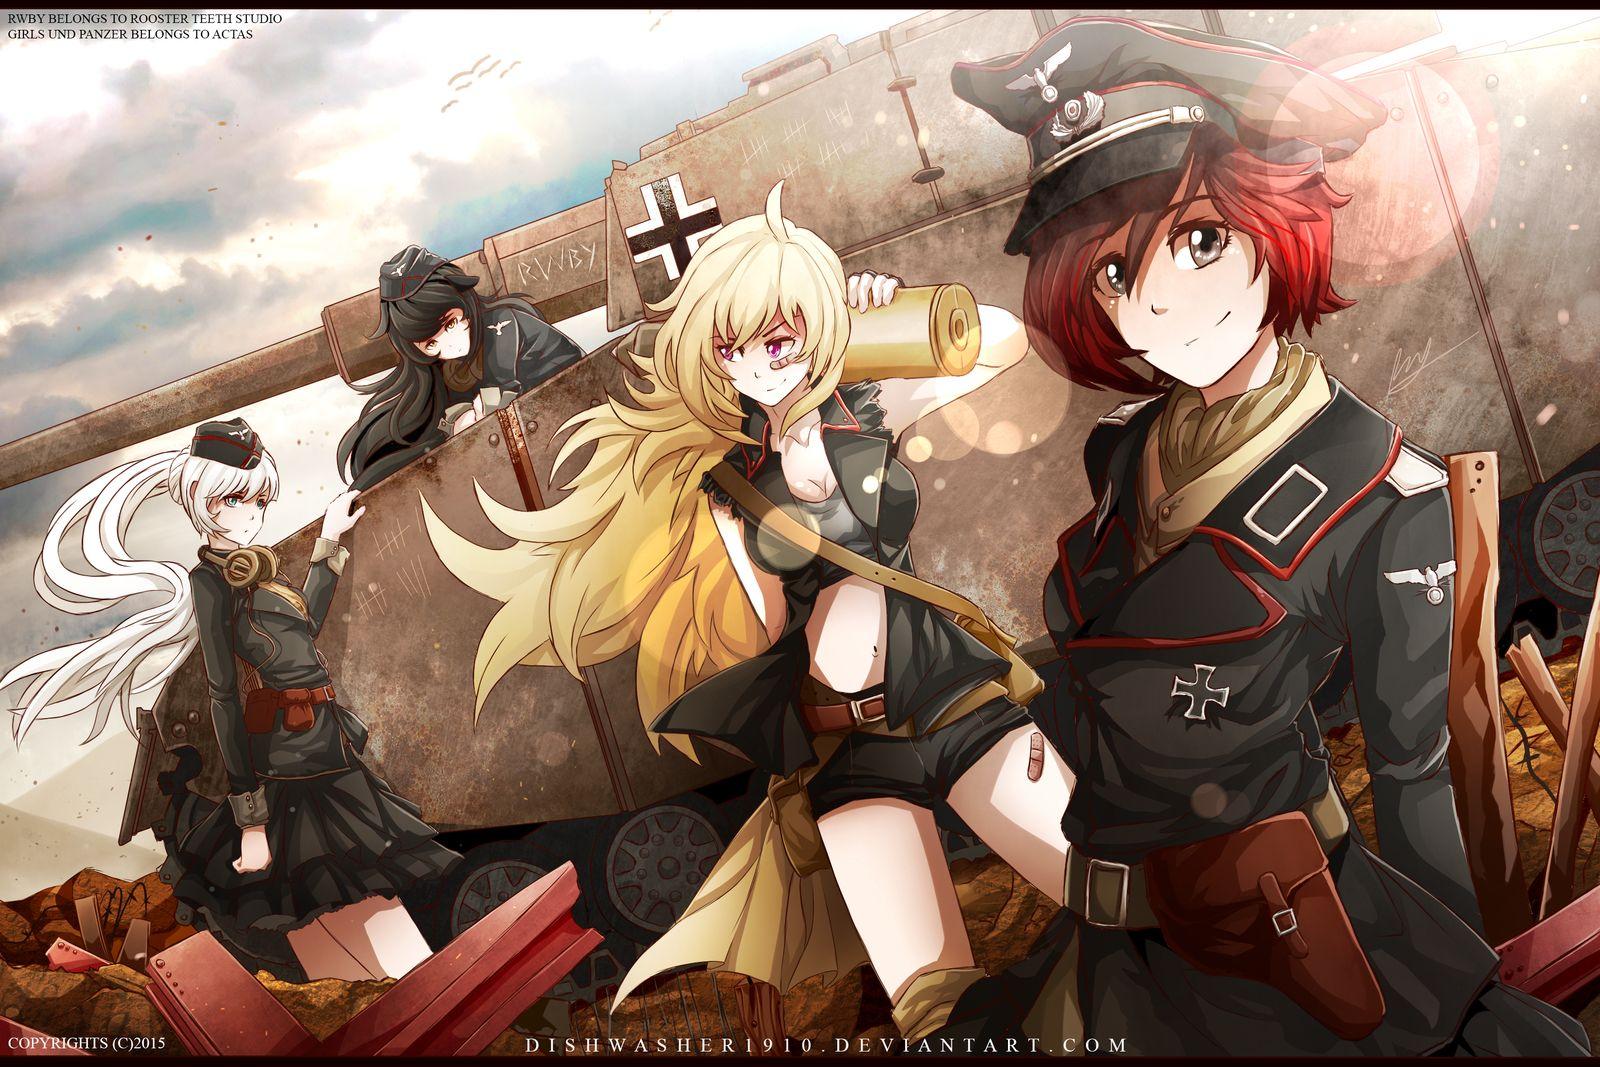 Military Rwby | Rwby | Rwby, Anime military, Rwby fanart